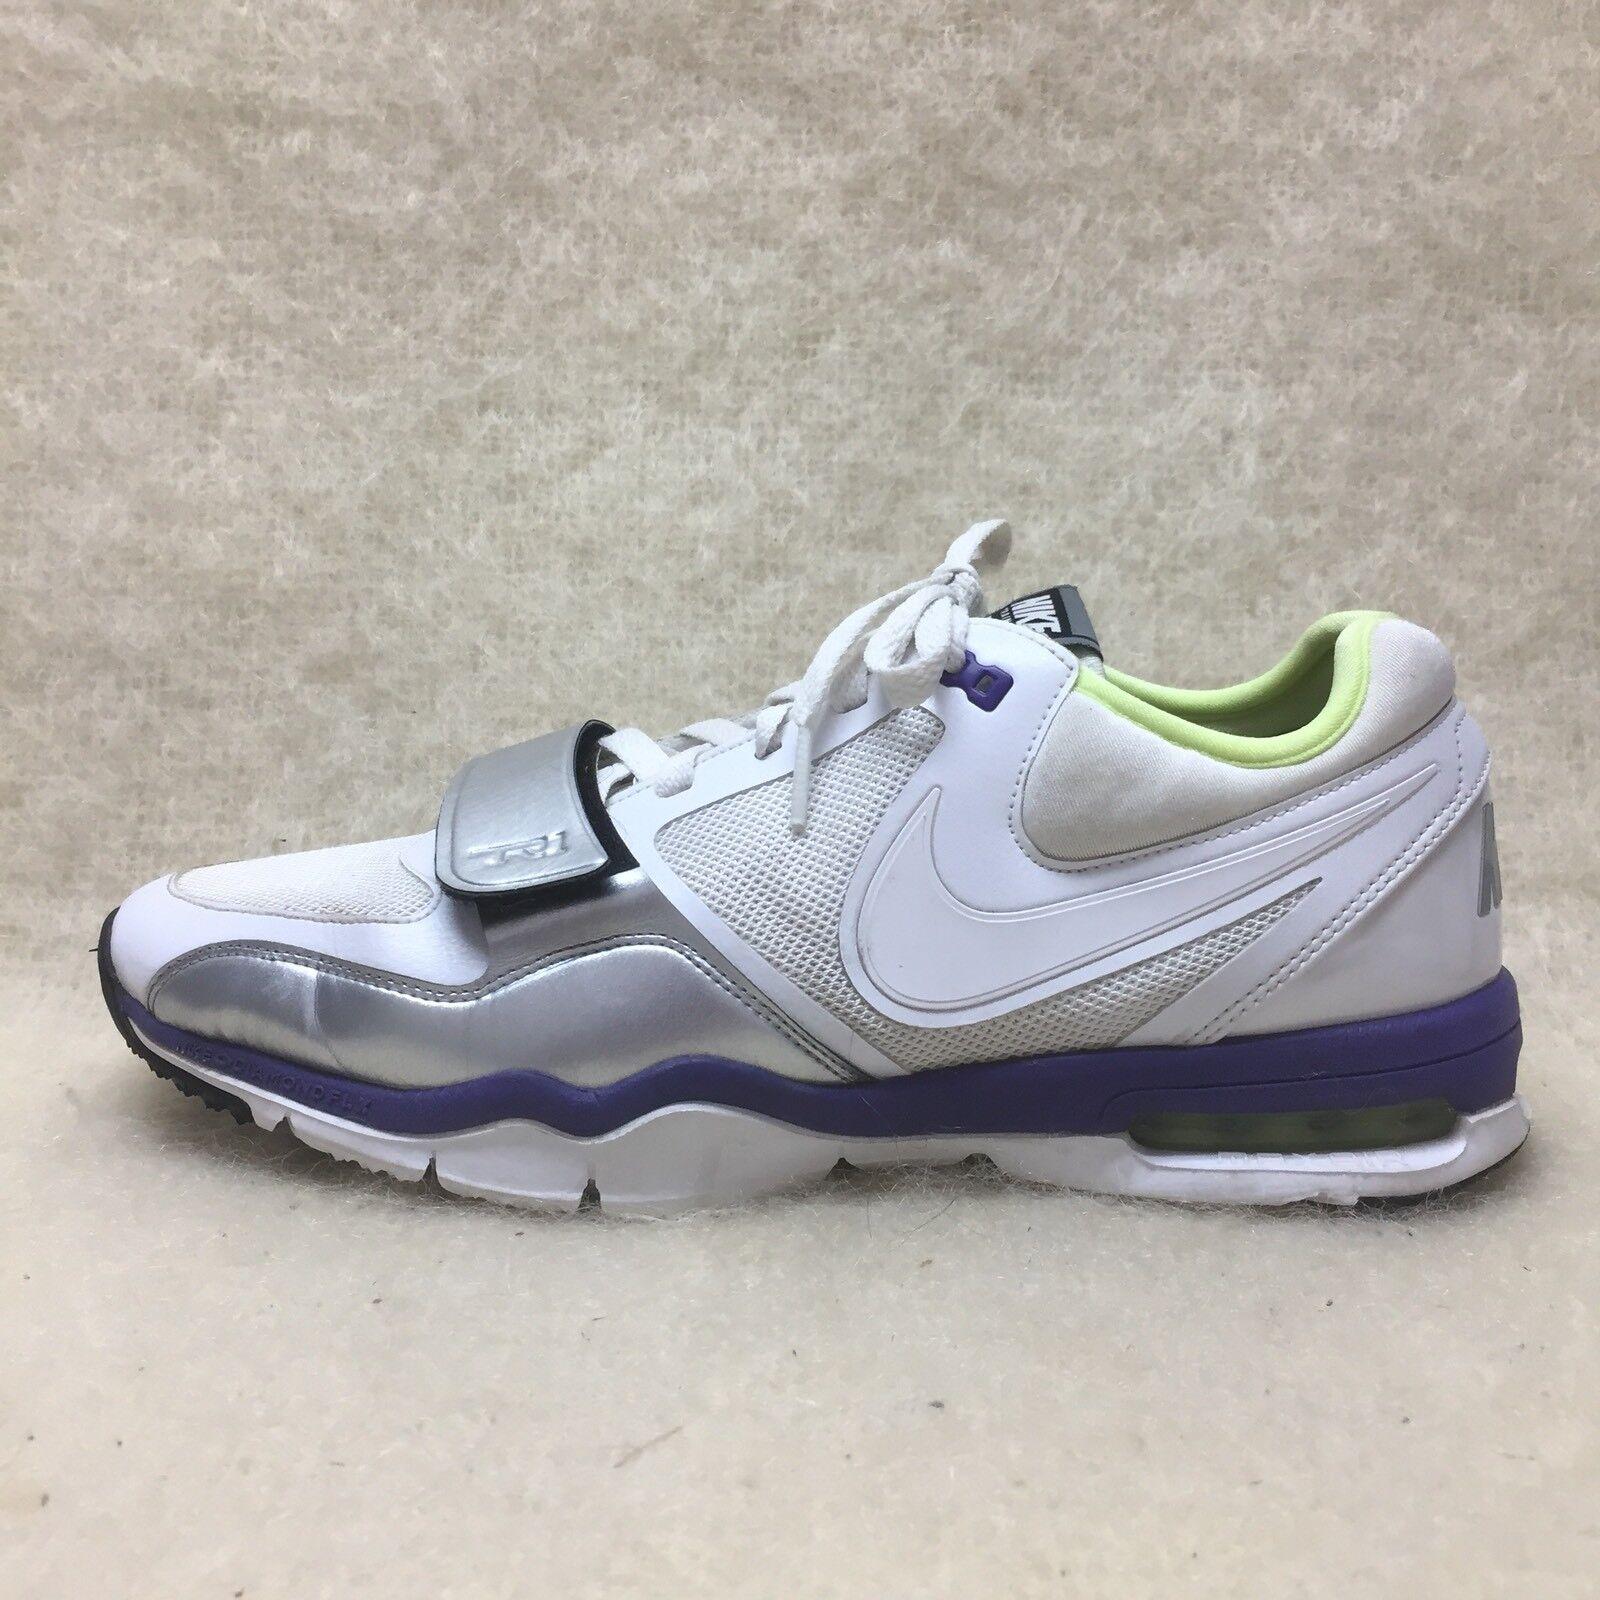 nike 407865-111 entraîneur max air femmes taille 11 Blanc   Vert   Violet  2f0c9e